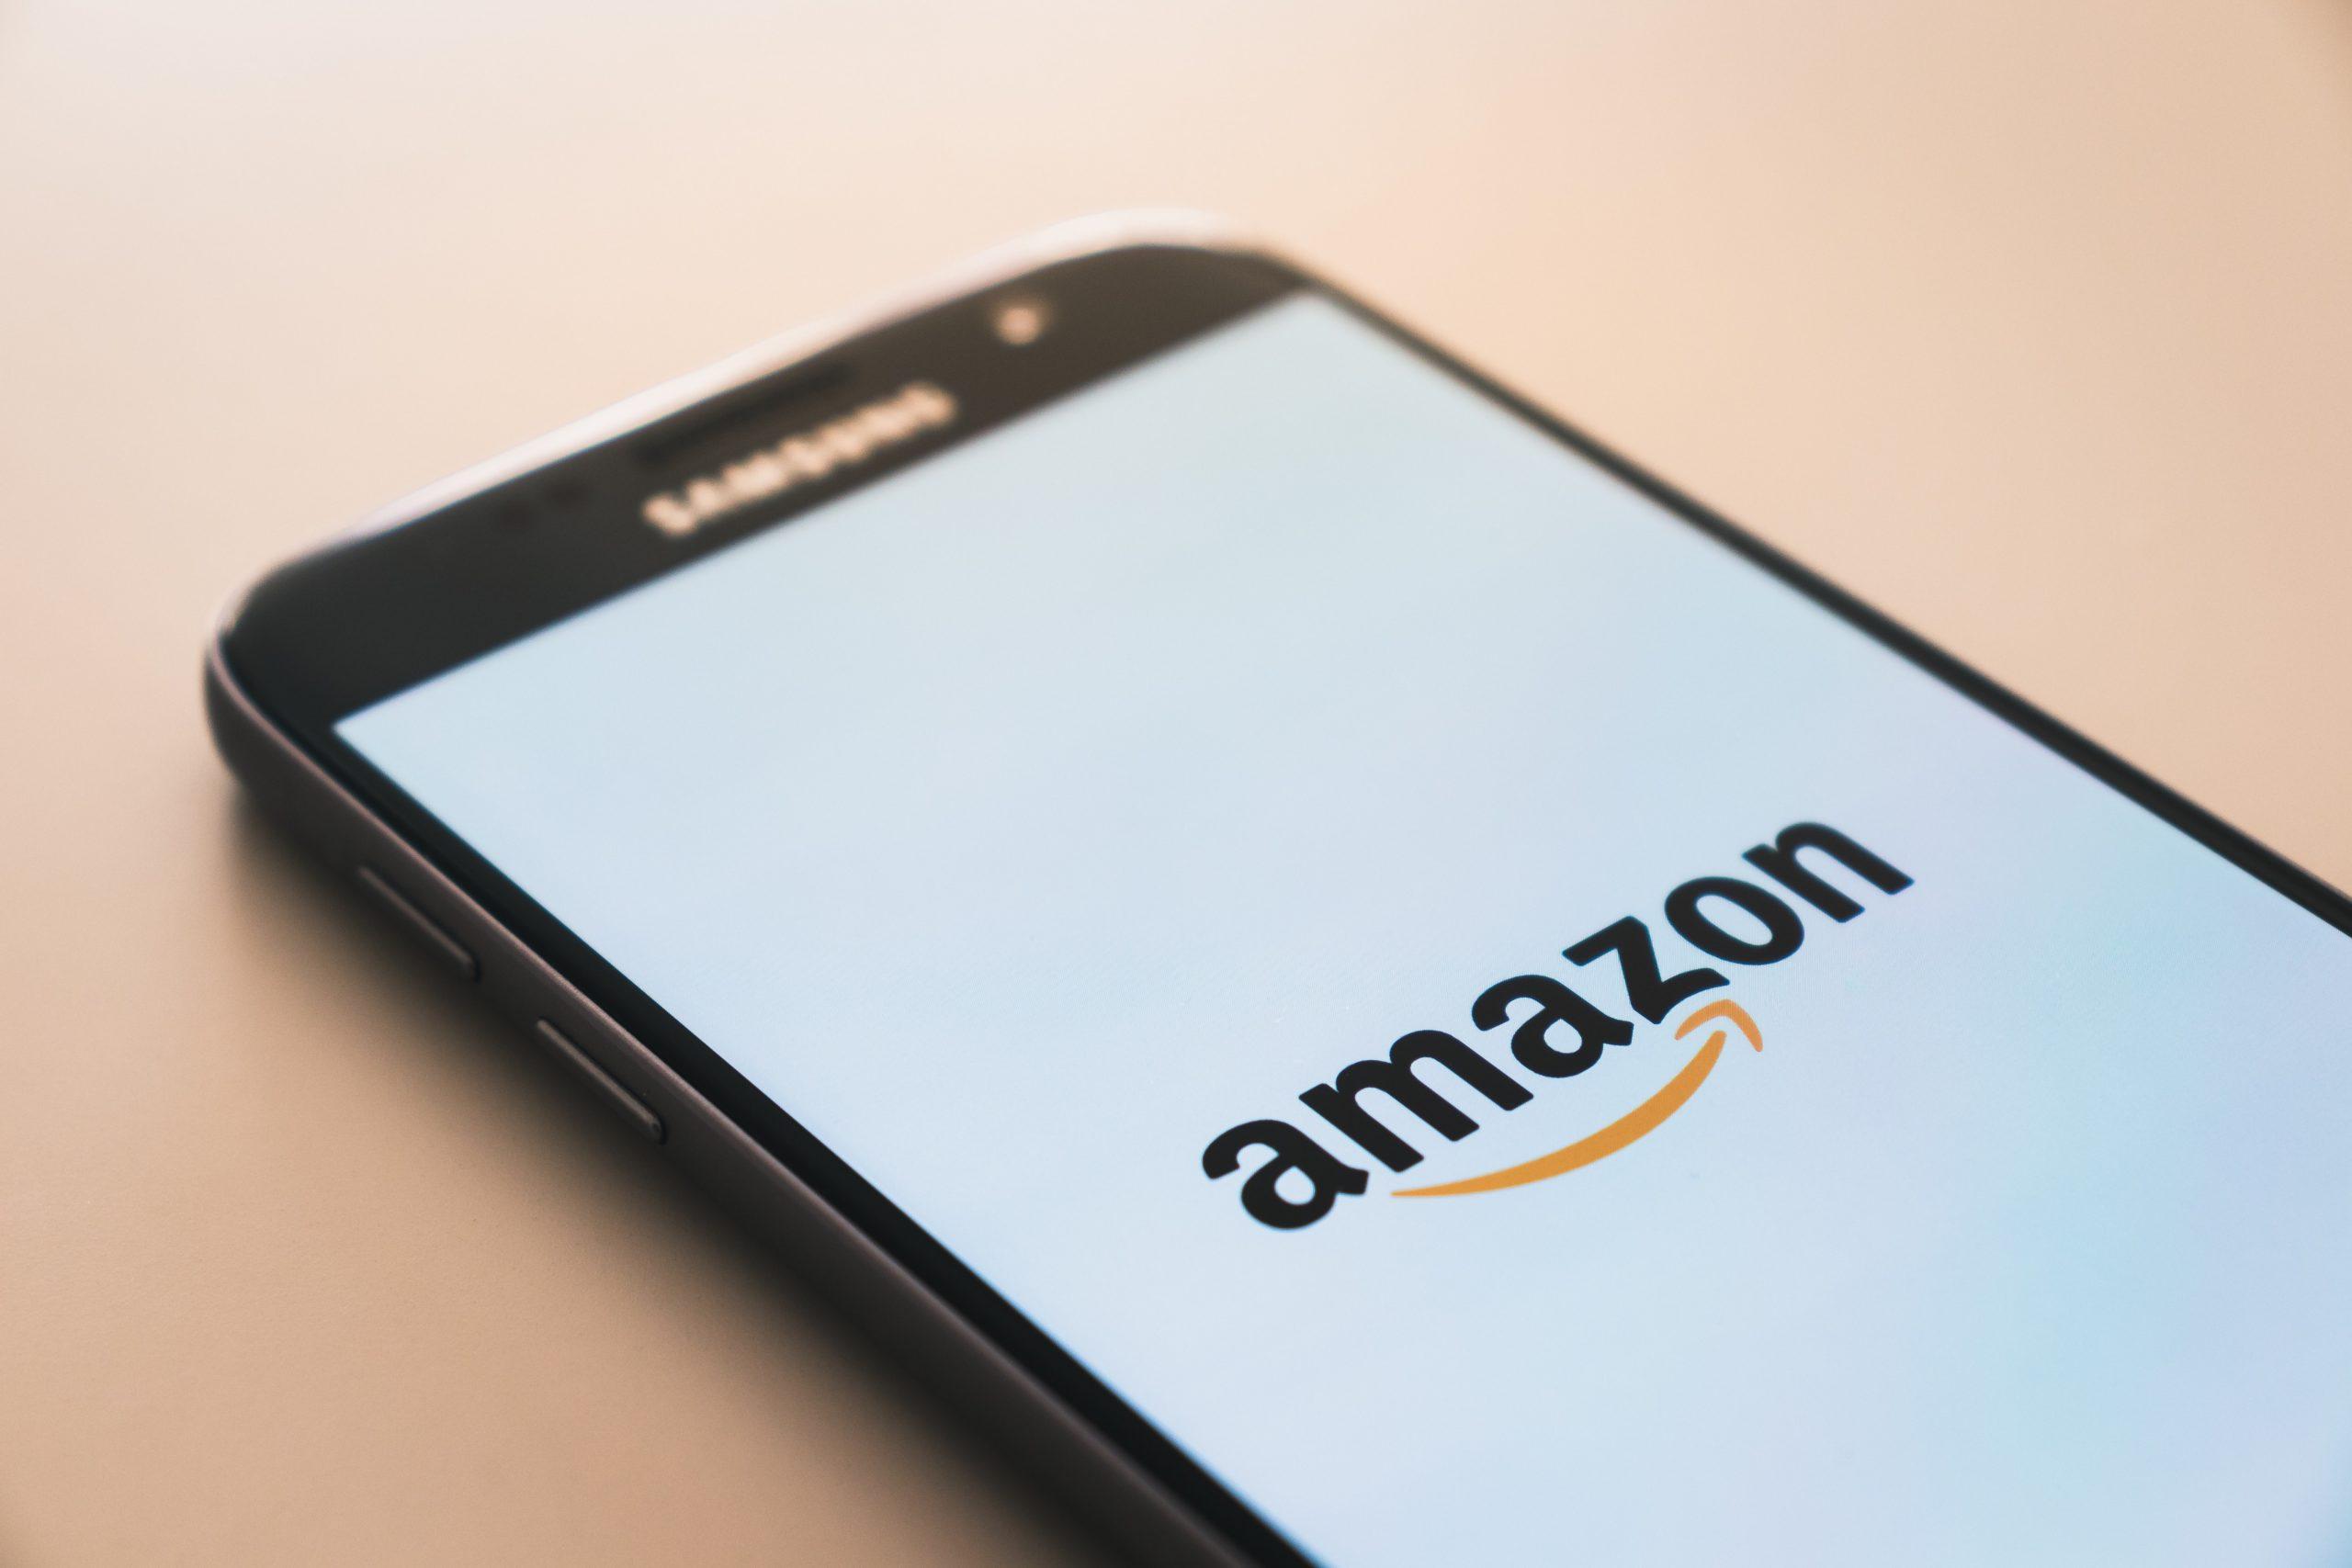 Celular na mesa com logo da Amazon